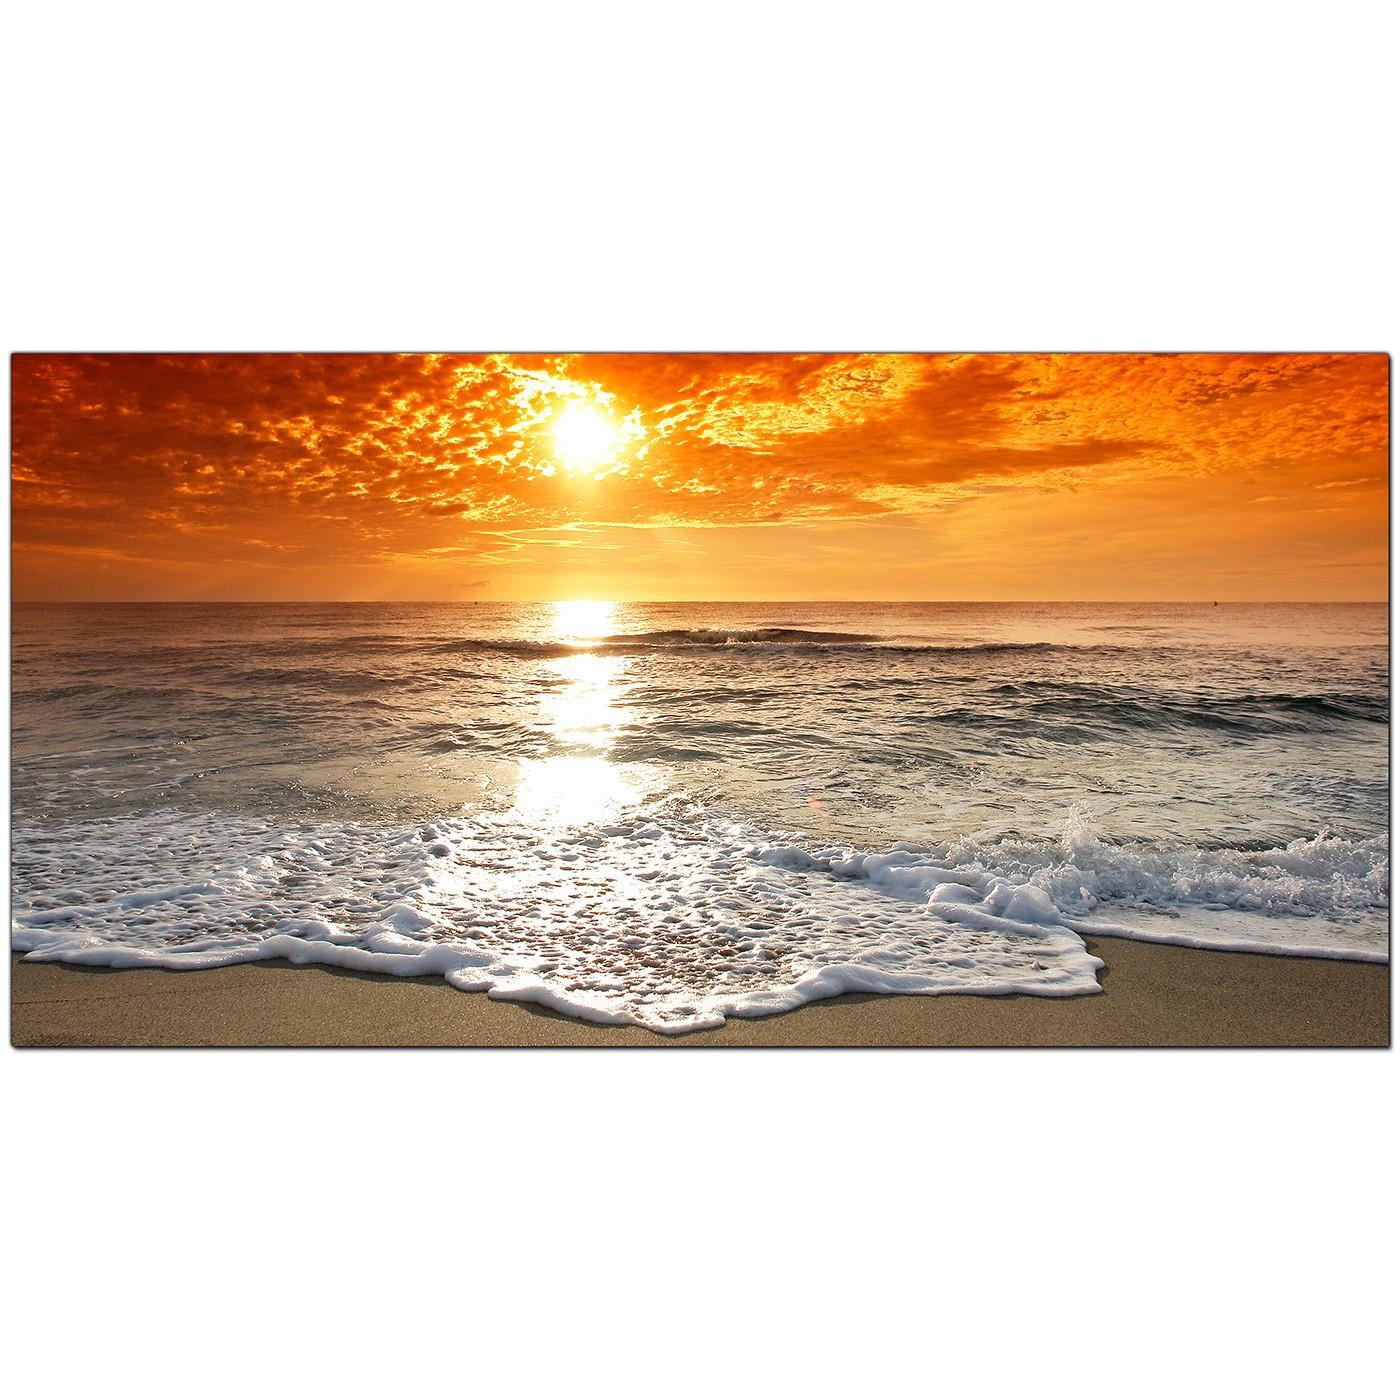 Display Gallery Item 5 Orange Bedroom Extra Large Canvas Of Sunset Beach Landscape 6